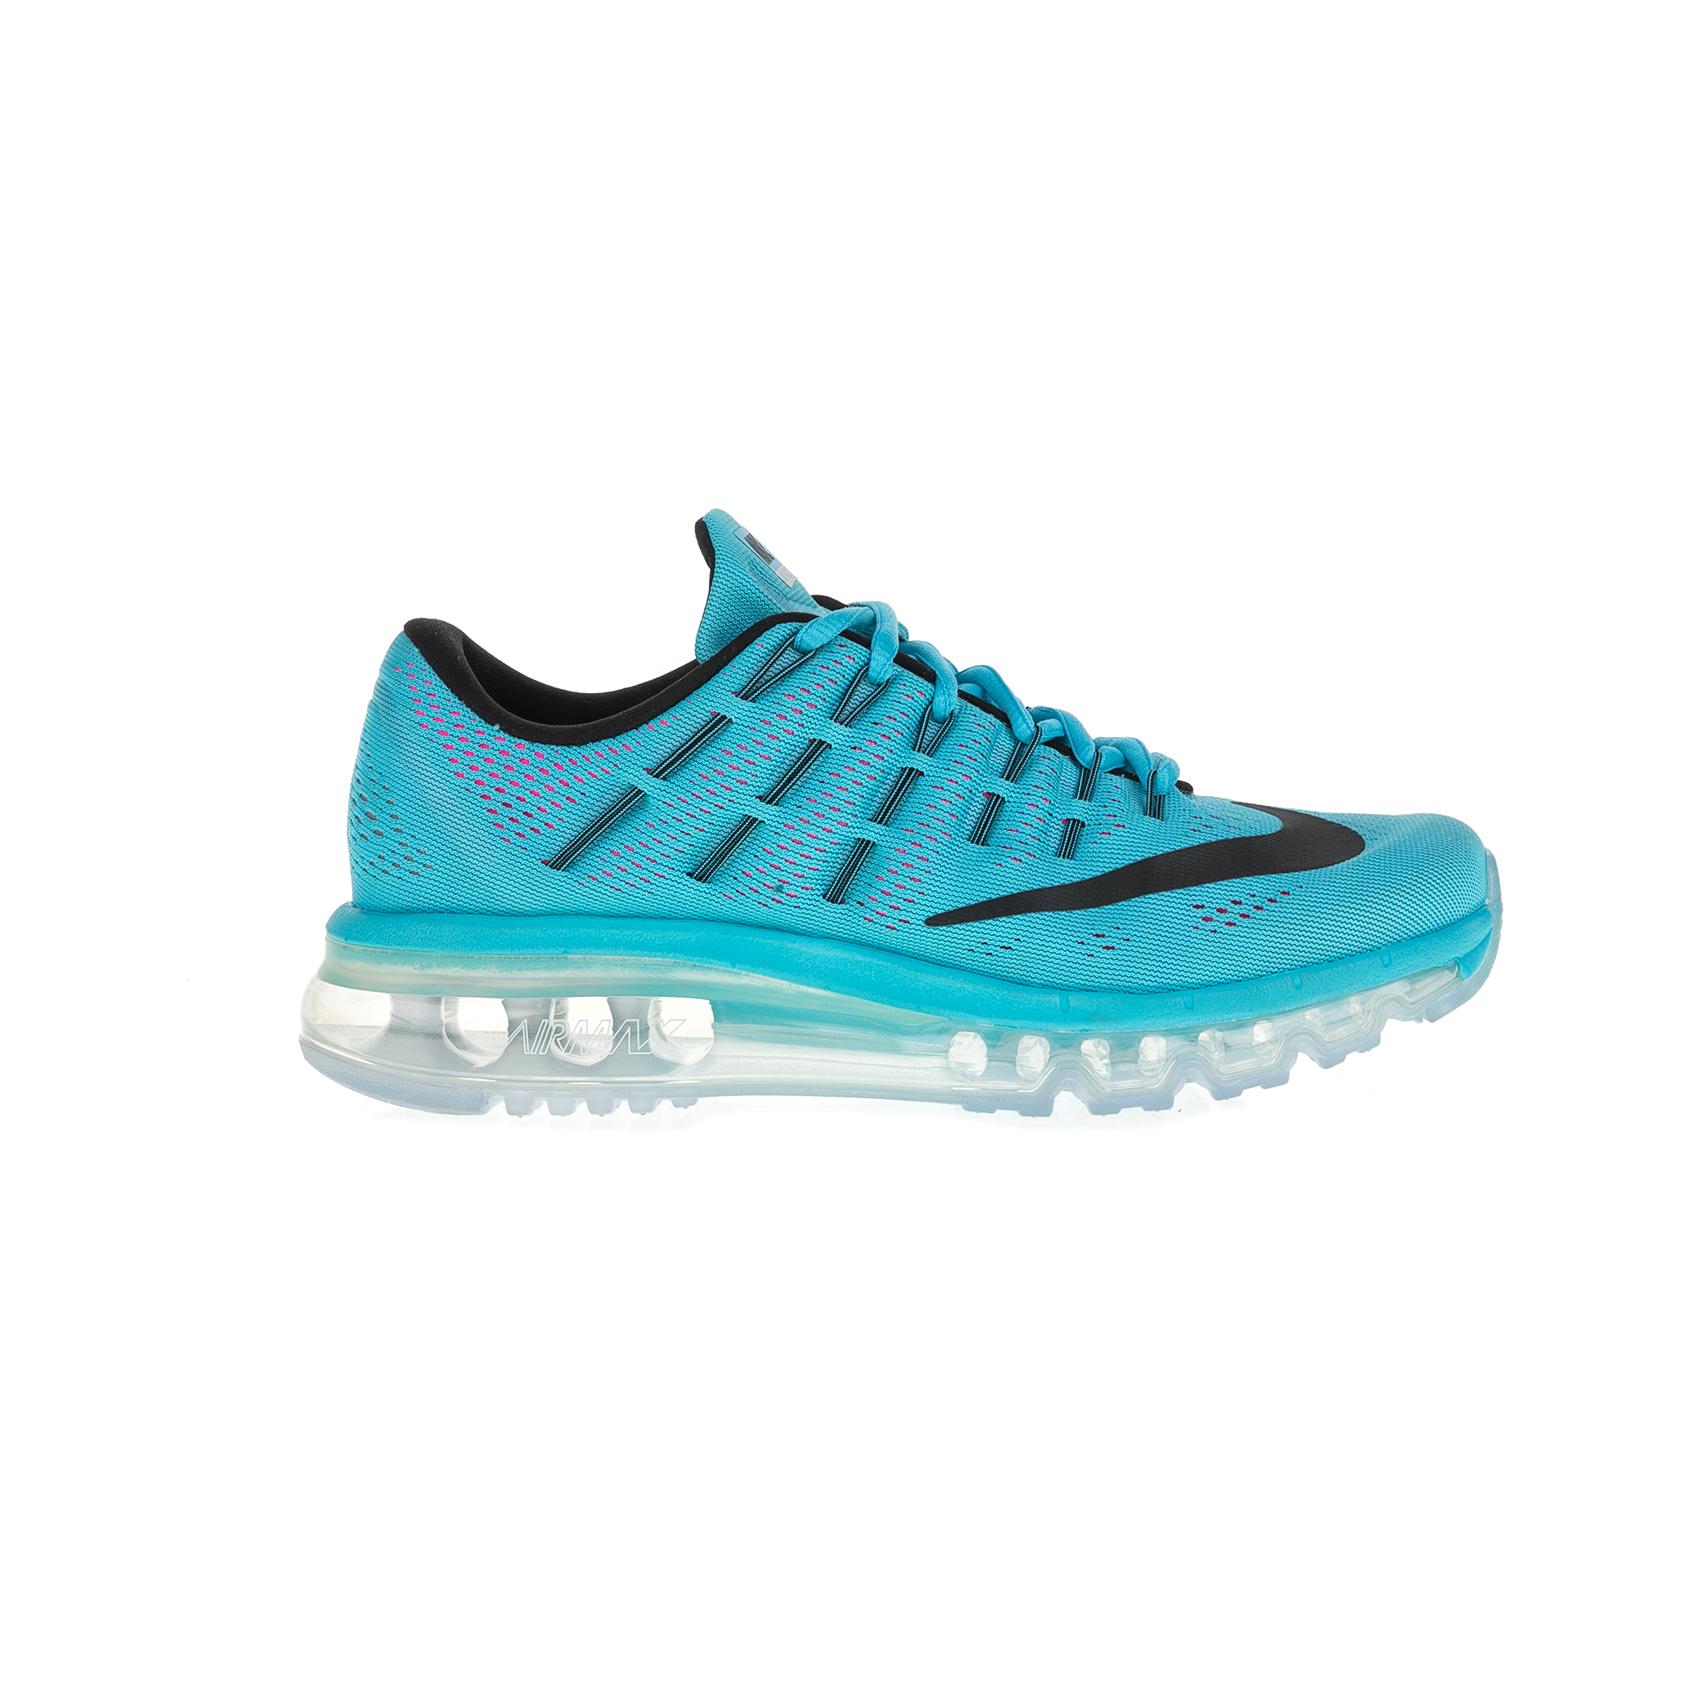 NIKE - Γυναικεία παπούτσια NIKE AIR MAX 2016 (GS) μπλε γυναικεία παπούτσια αθλητικά running